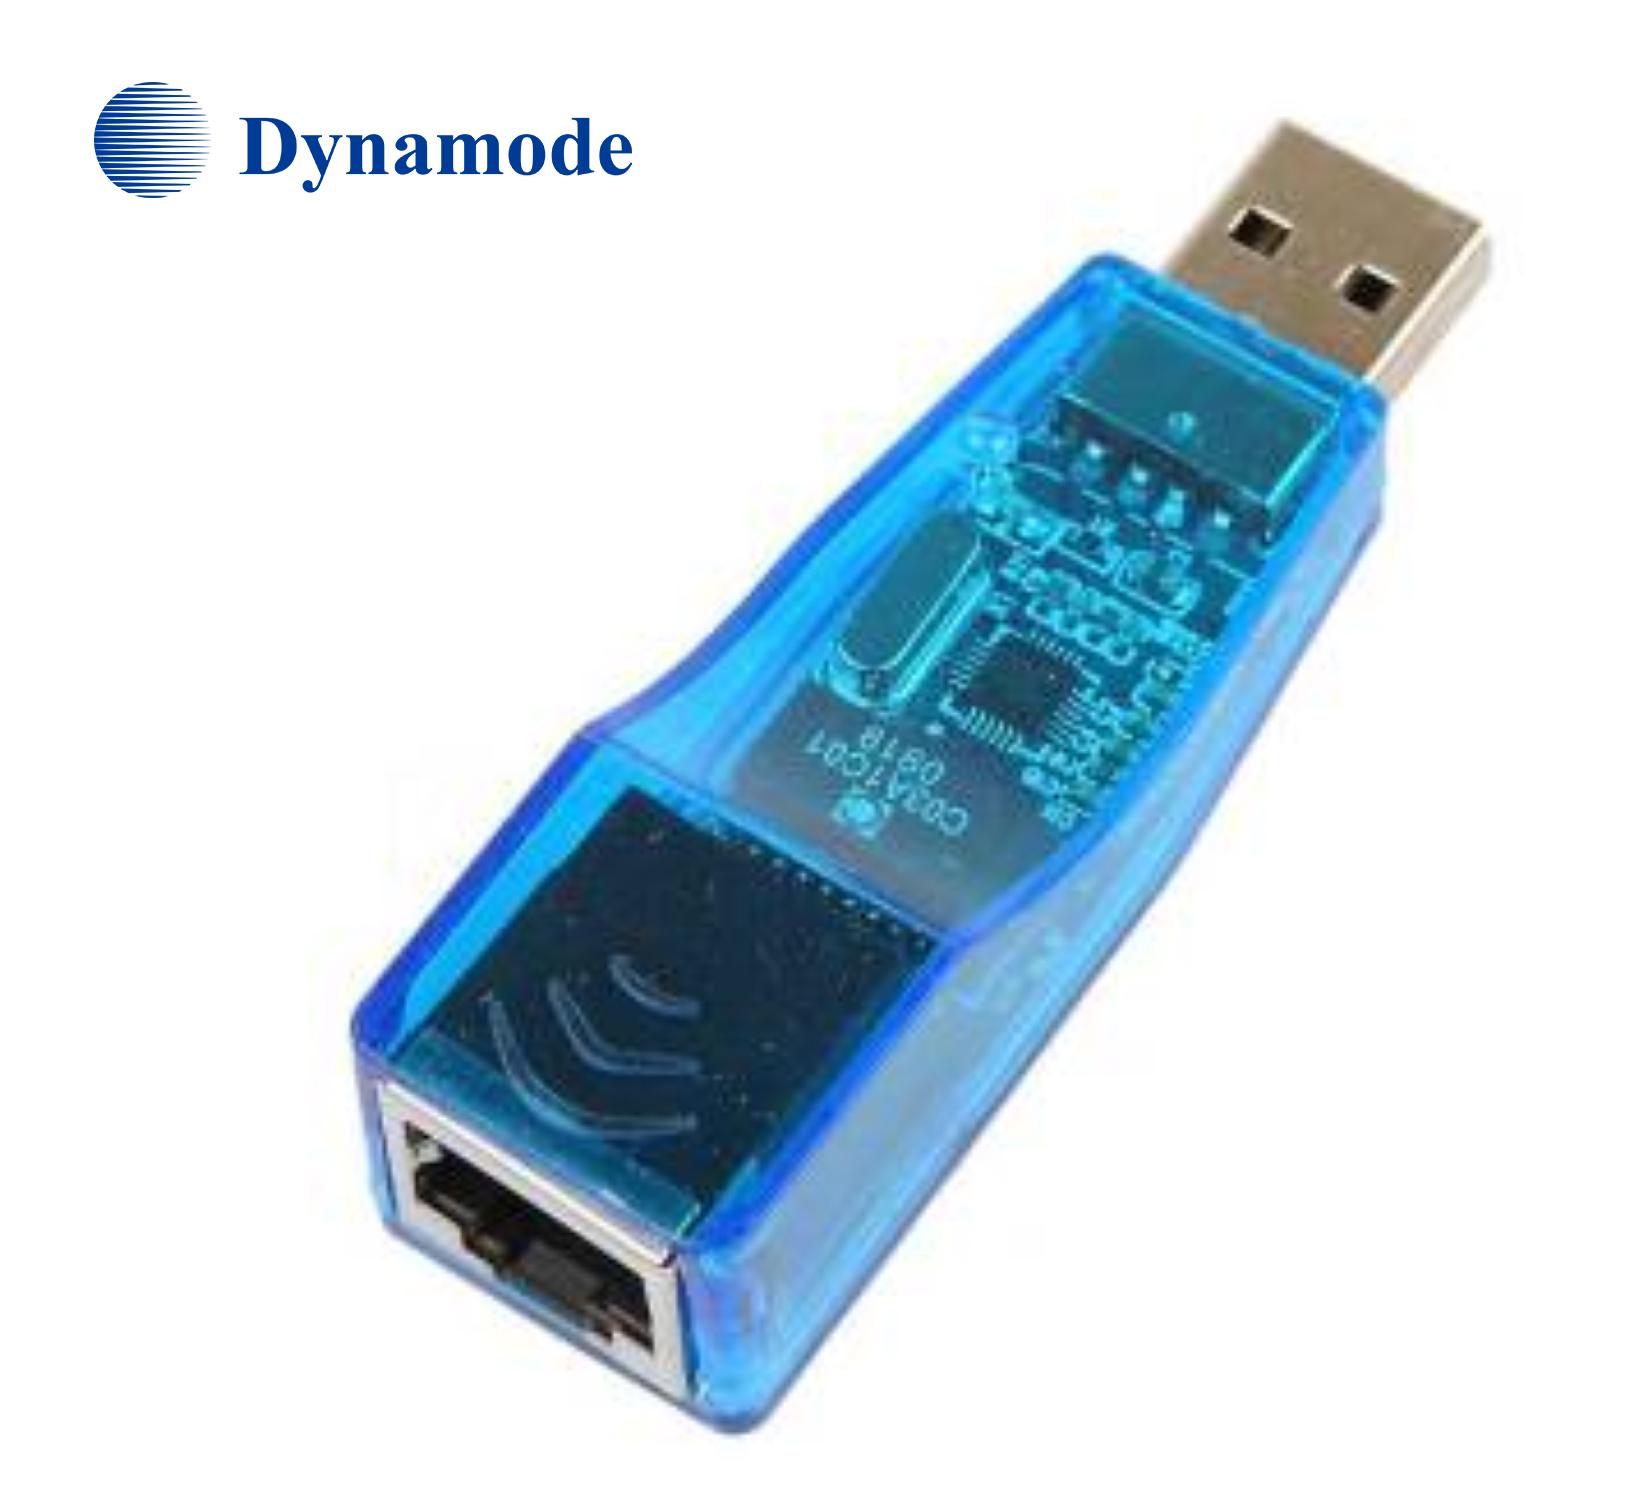 כרטיס רשת USB